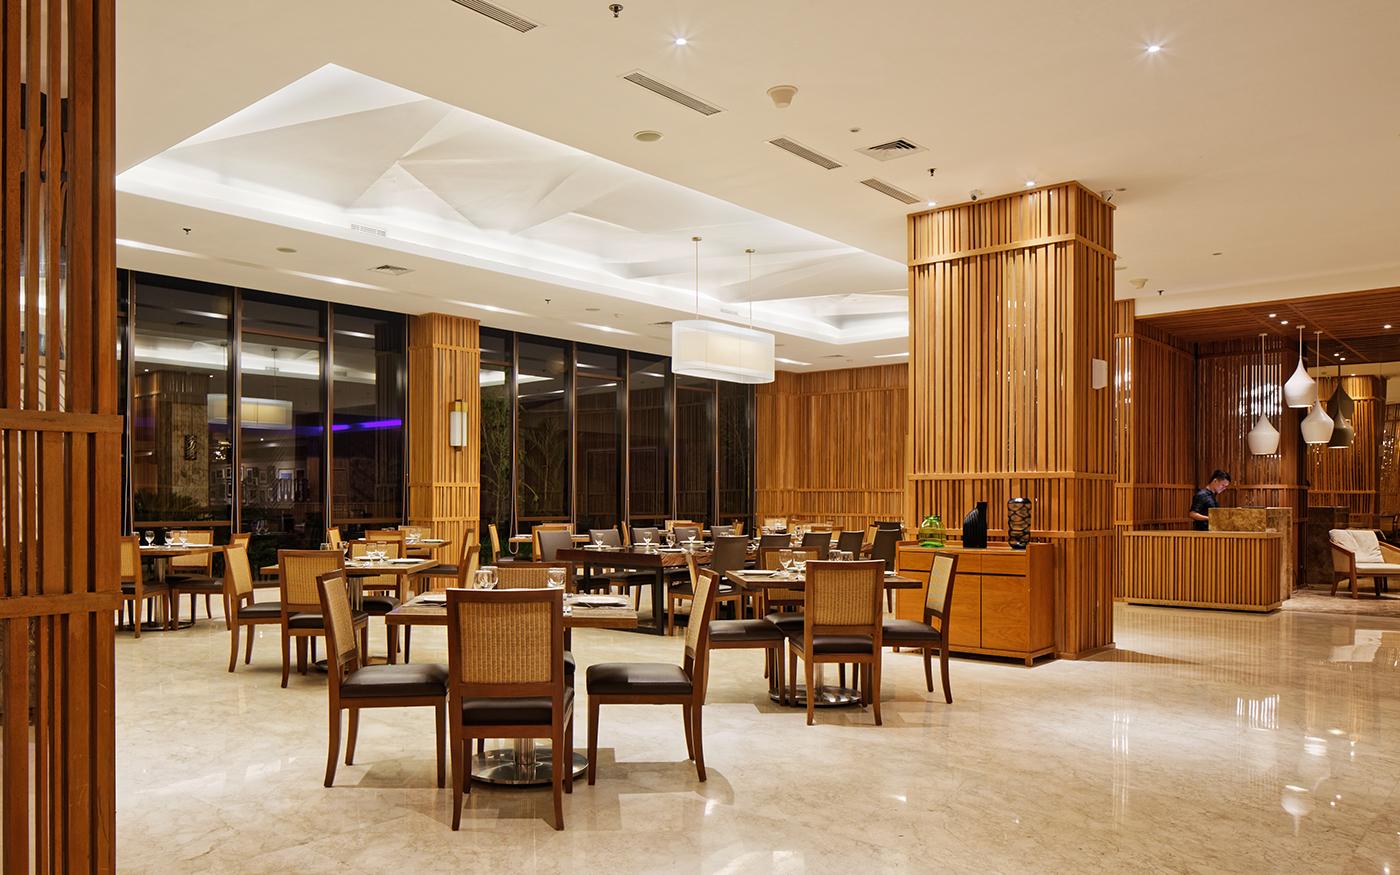 517-RINRA-Hotel-interior-(TSID)--07__09.11.2017-